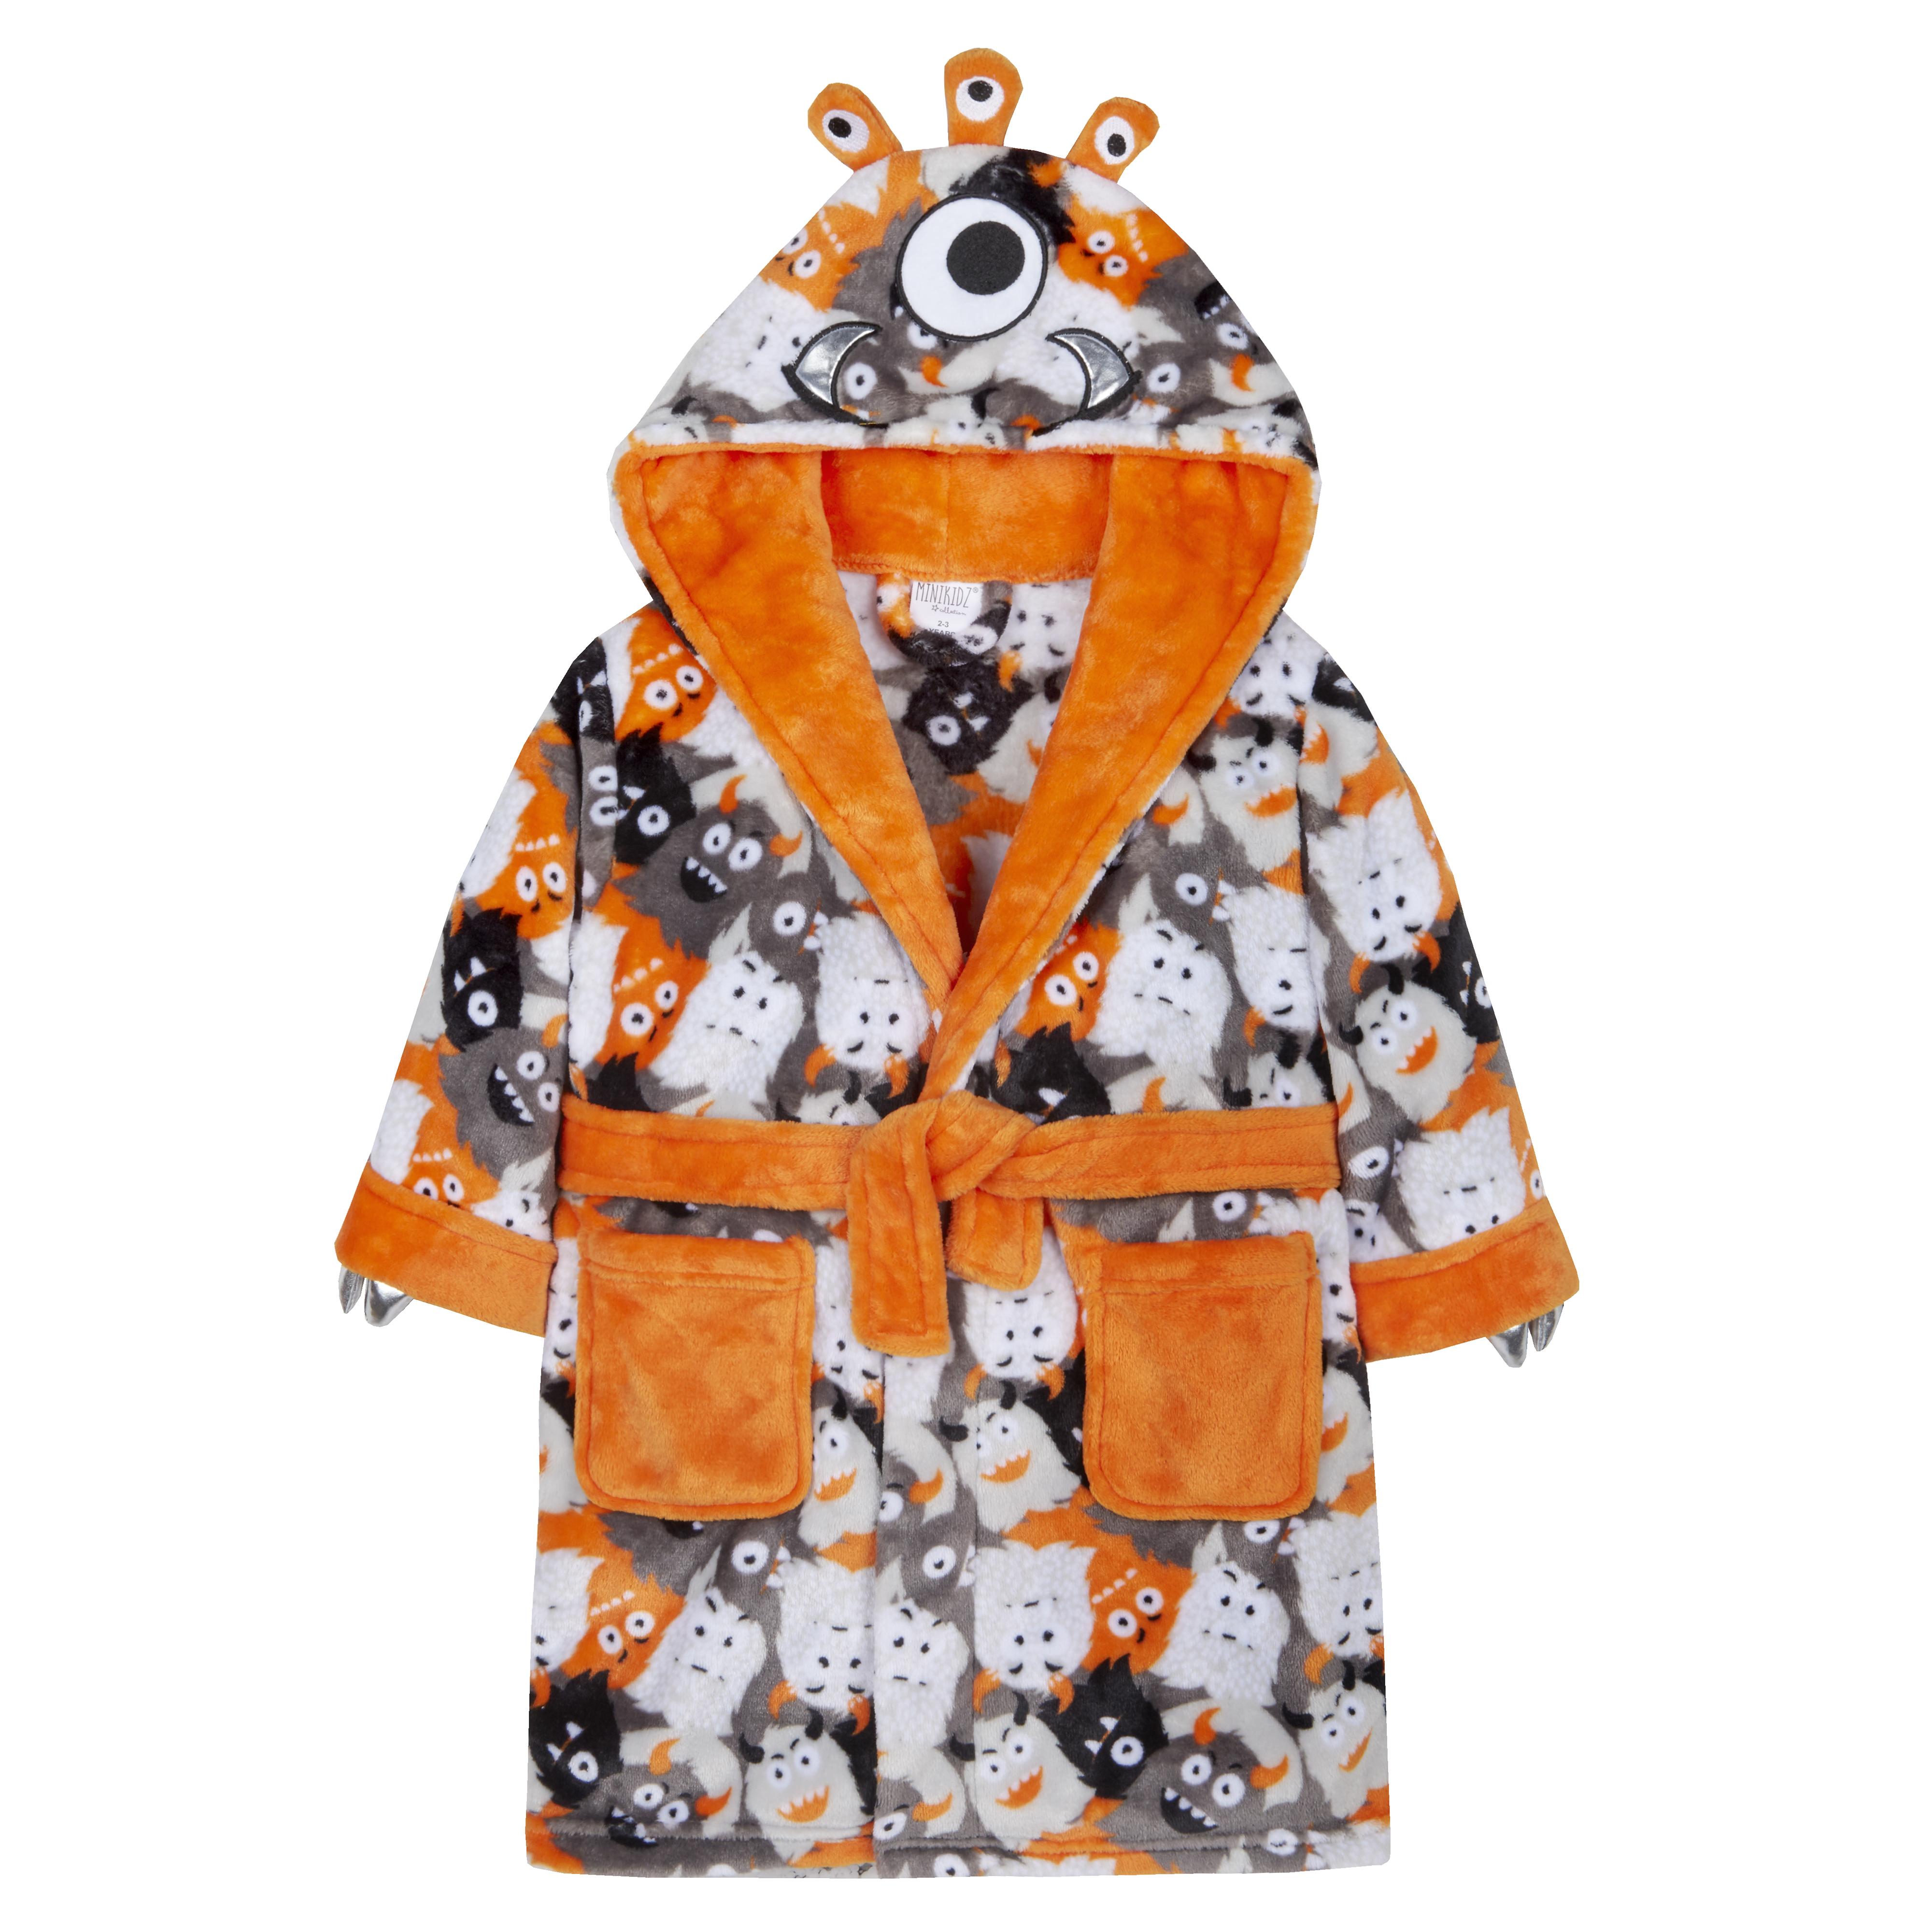 Minikidz Boys Dinosaur Camo Soft Fleece Dressing Gown with Hood